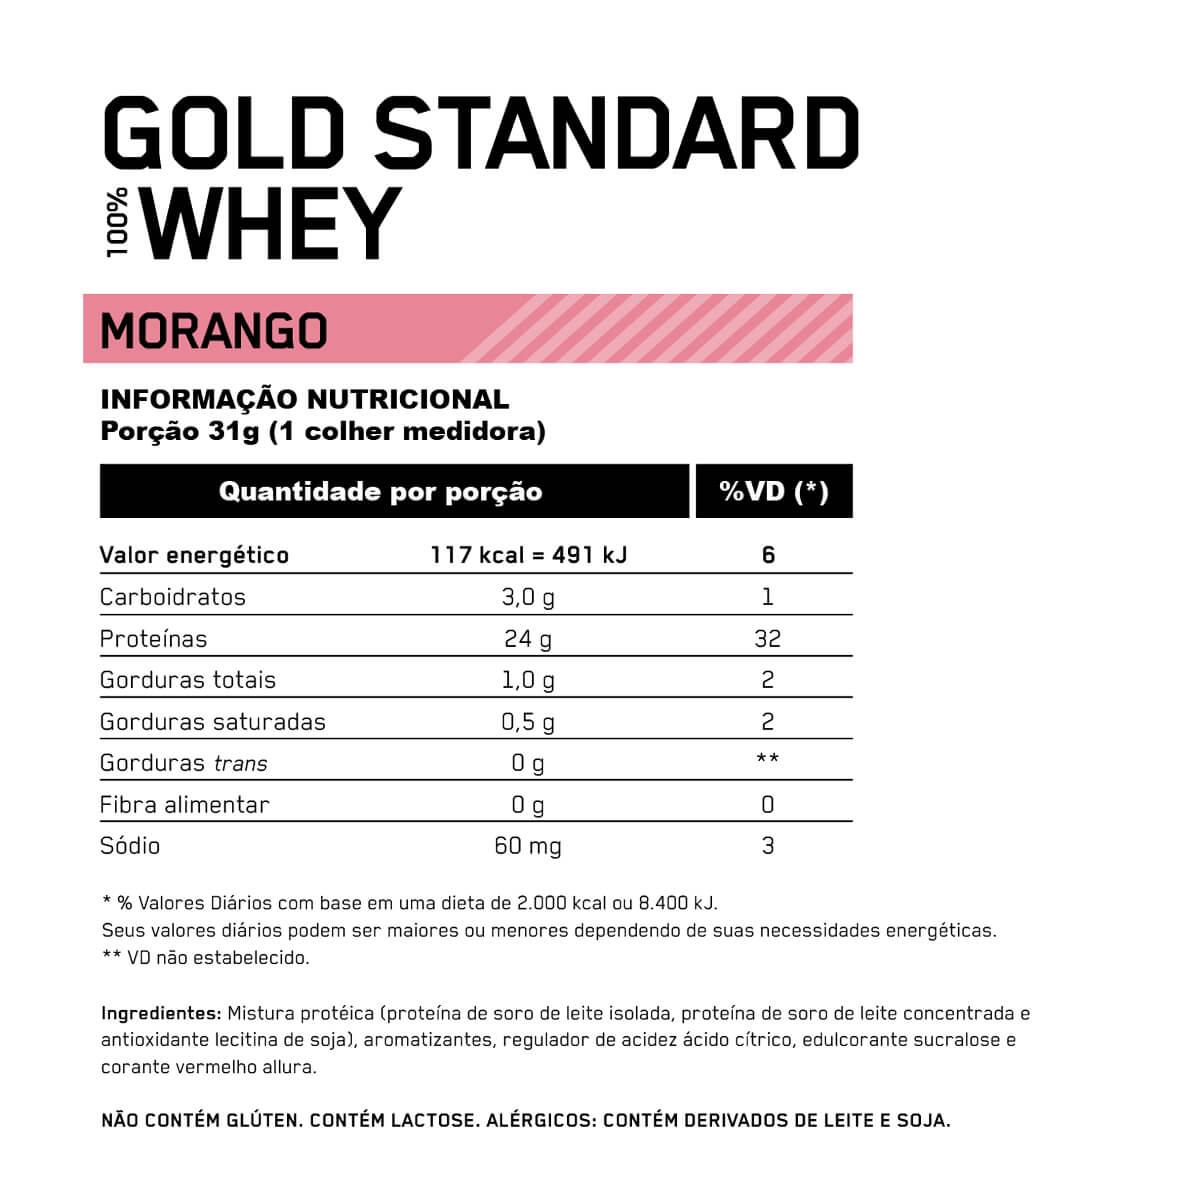 100 WHEY GOLD STANDARD (NOVA EMBALAGEM) (900G) - OPTIMUM NUTRITION - MORANGO